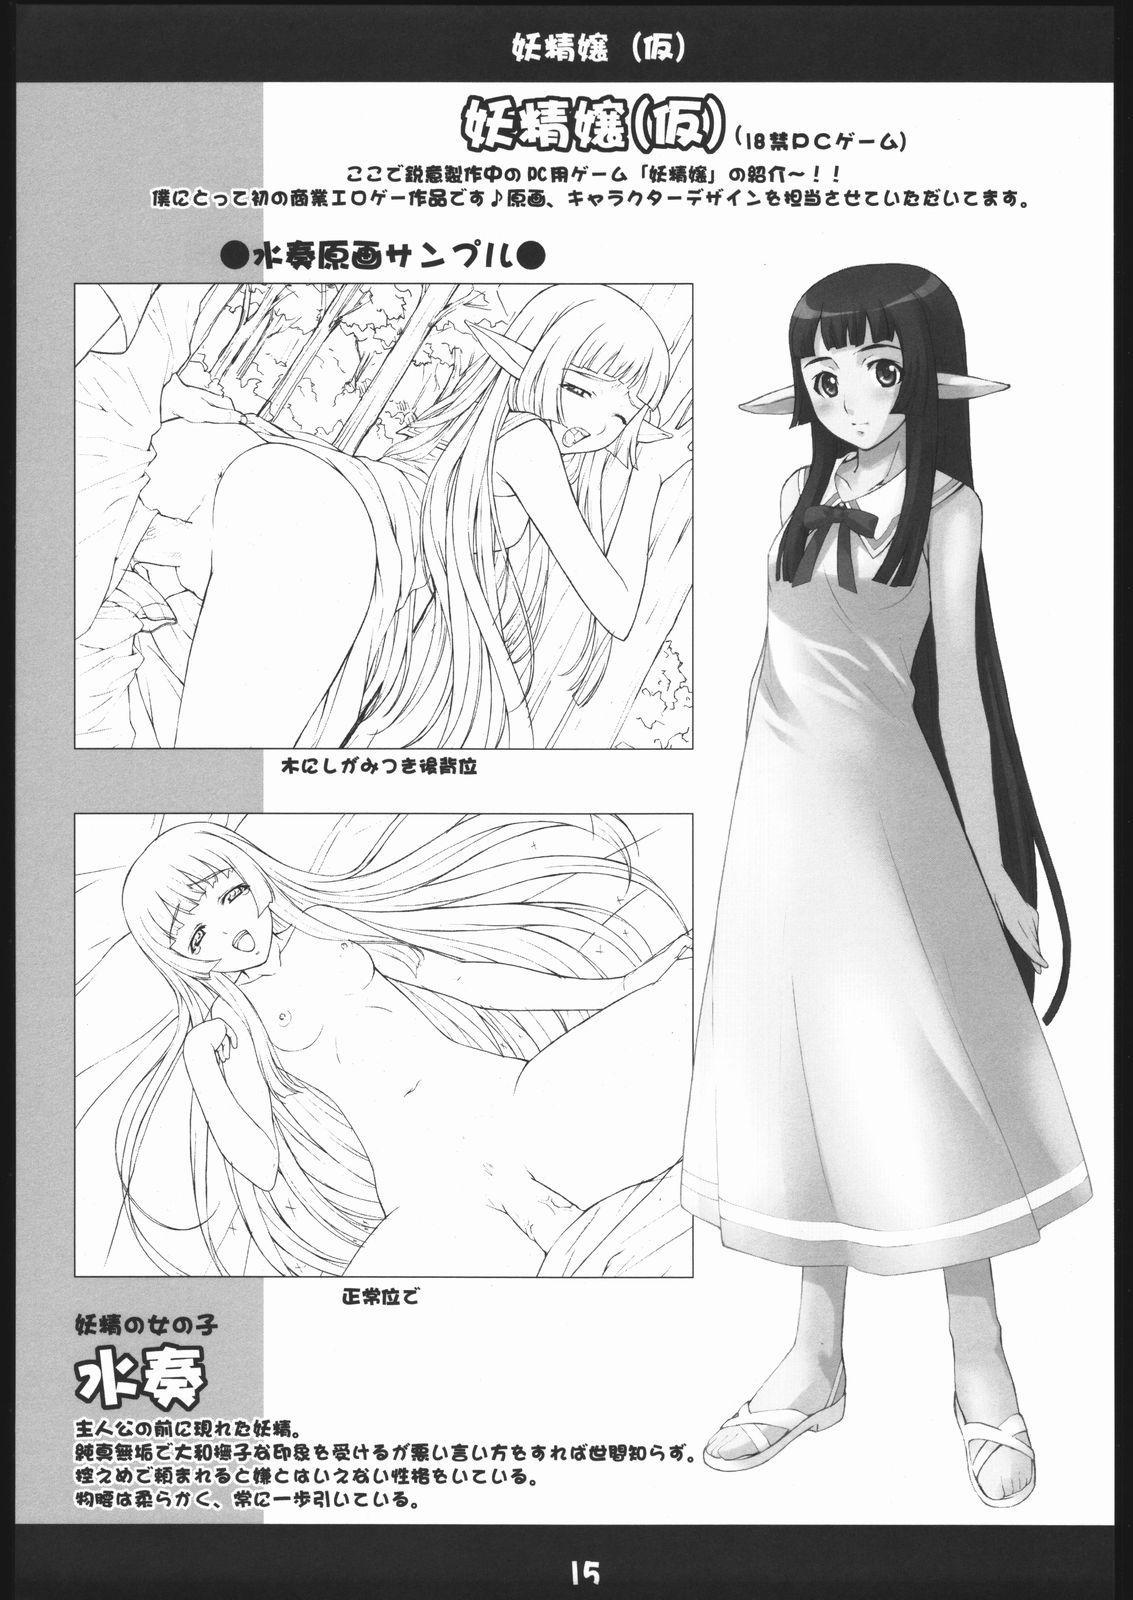 Himenatsu 13